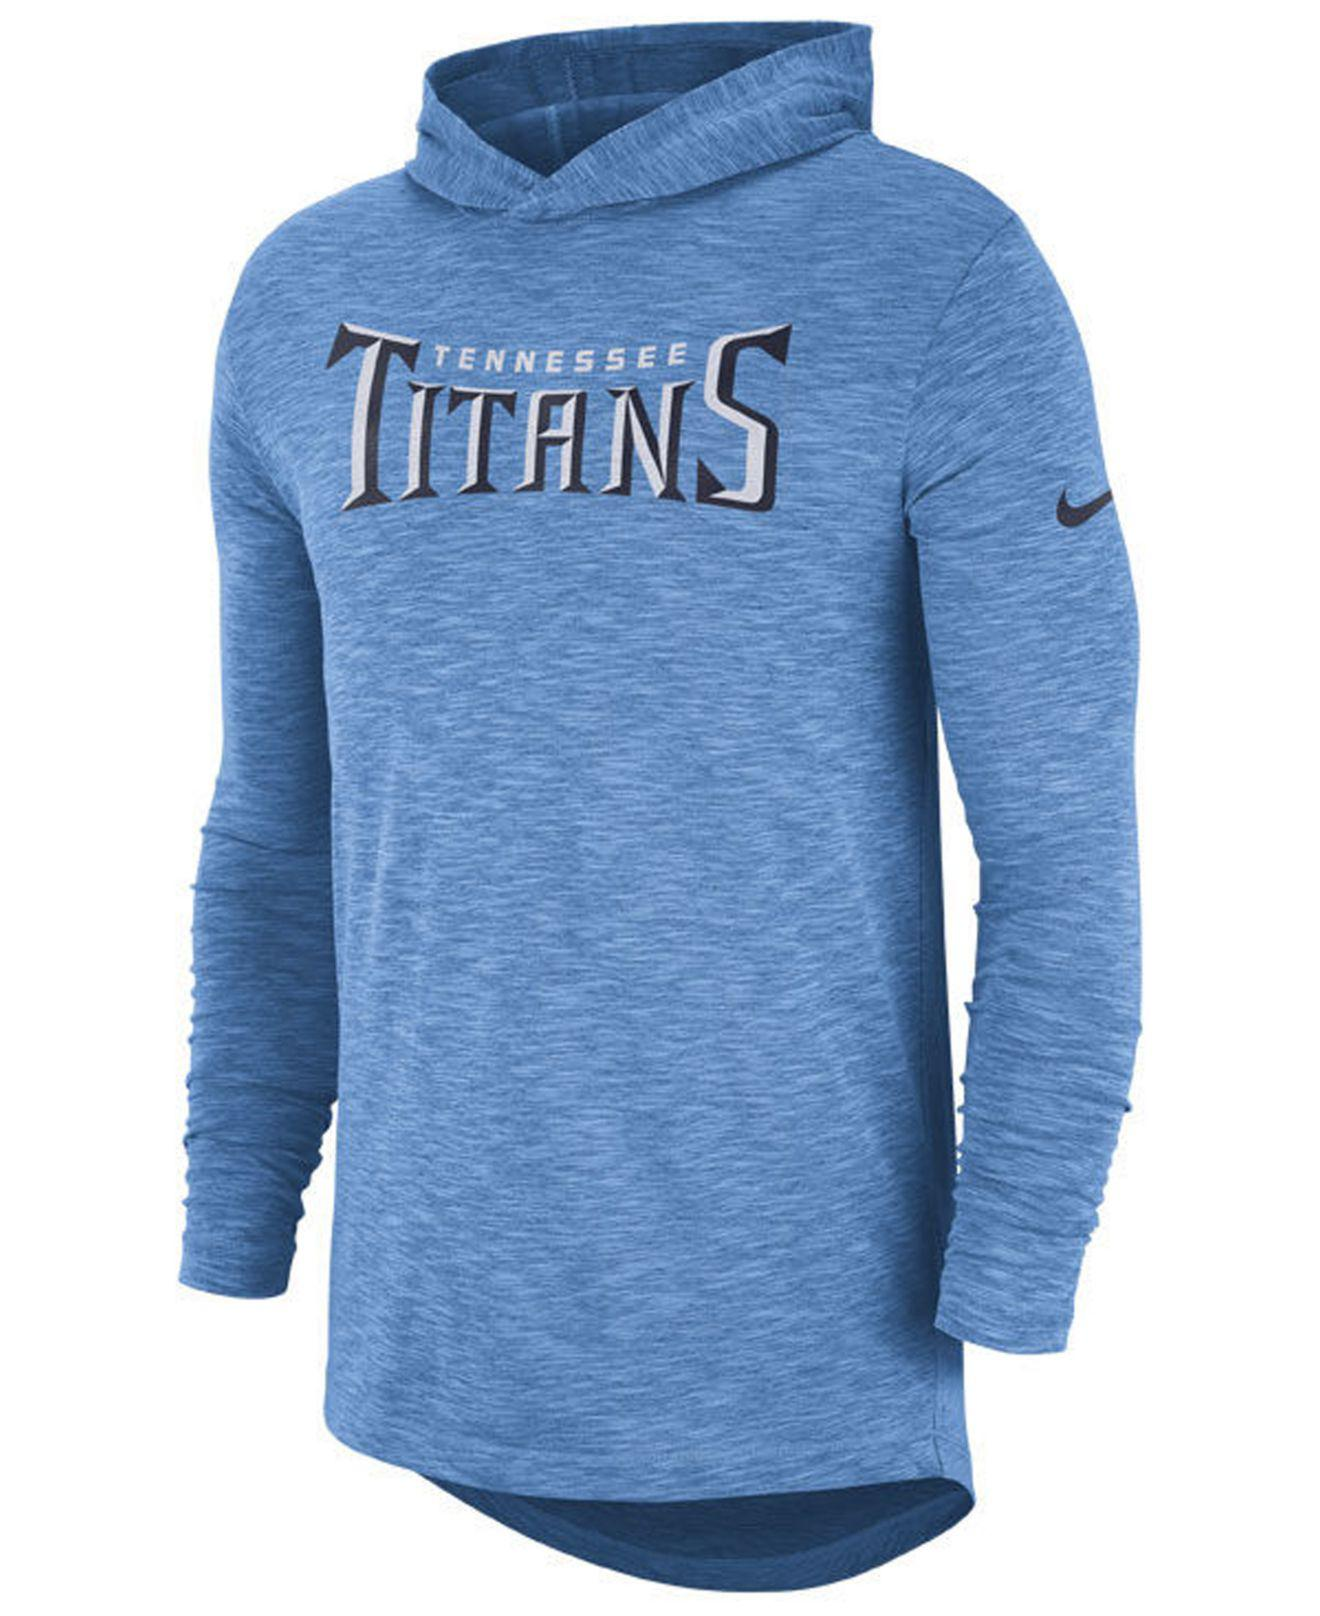 44658cb4c Nike. Men s Blue Tennessee Titans Dri-fit Cotton Slub On-field Hooded T -shirt